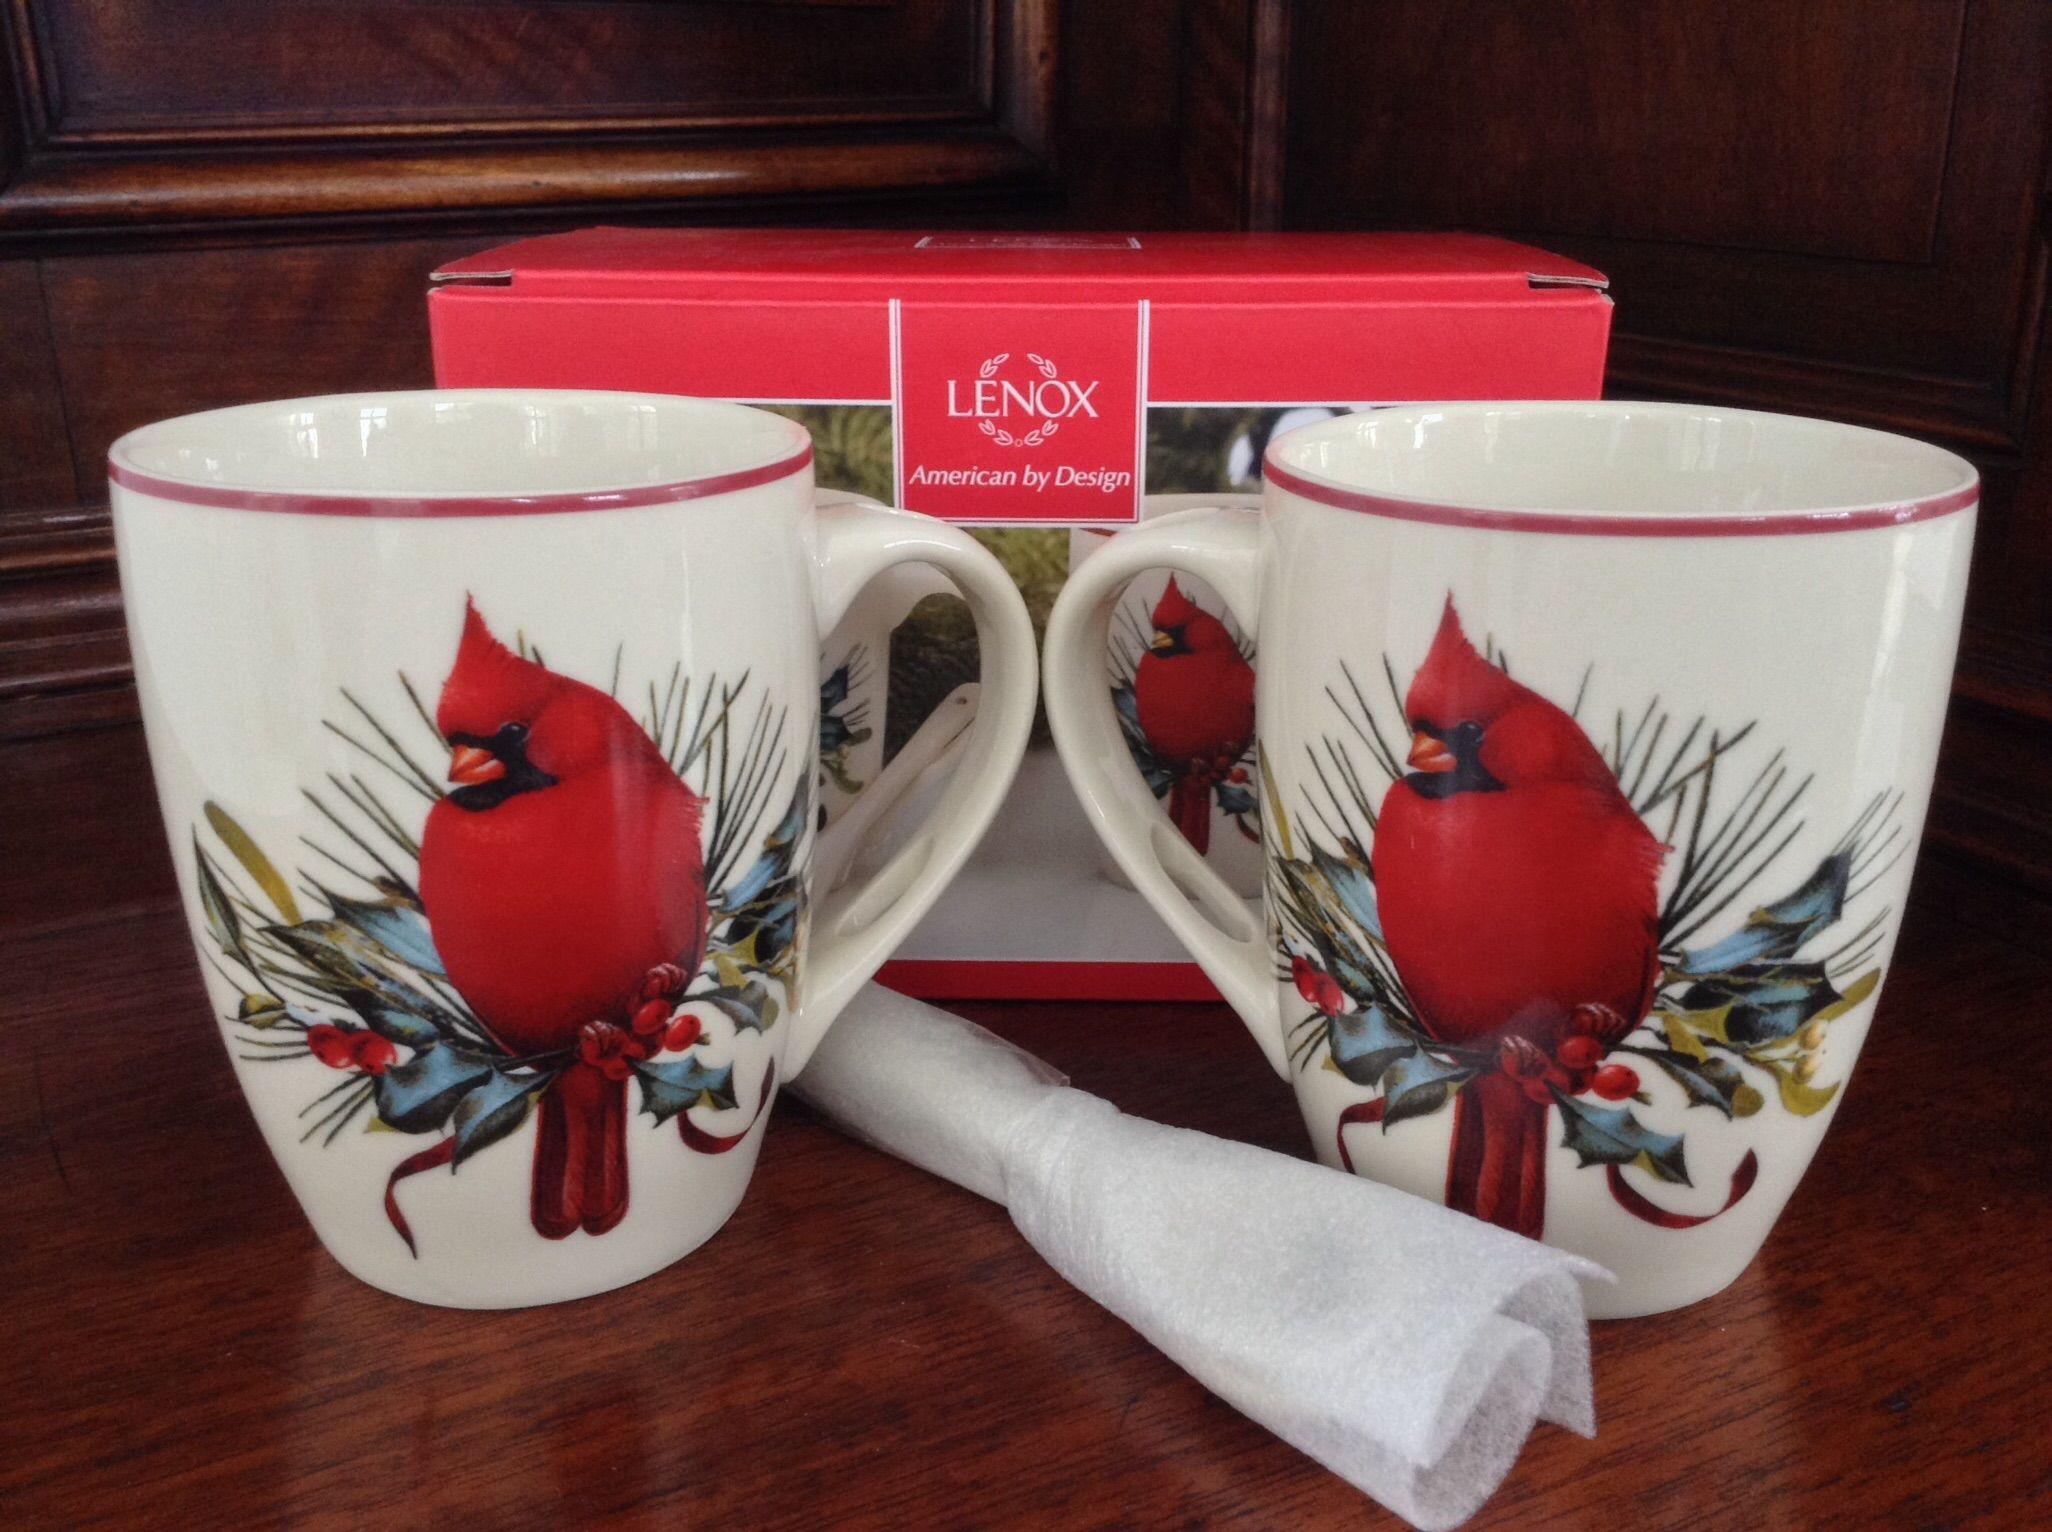 Lenox winter greetings mugs set of 2 home decor pinterest lenox winter greetings mugs set of 2 m4hsunfo